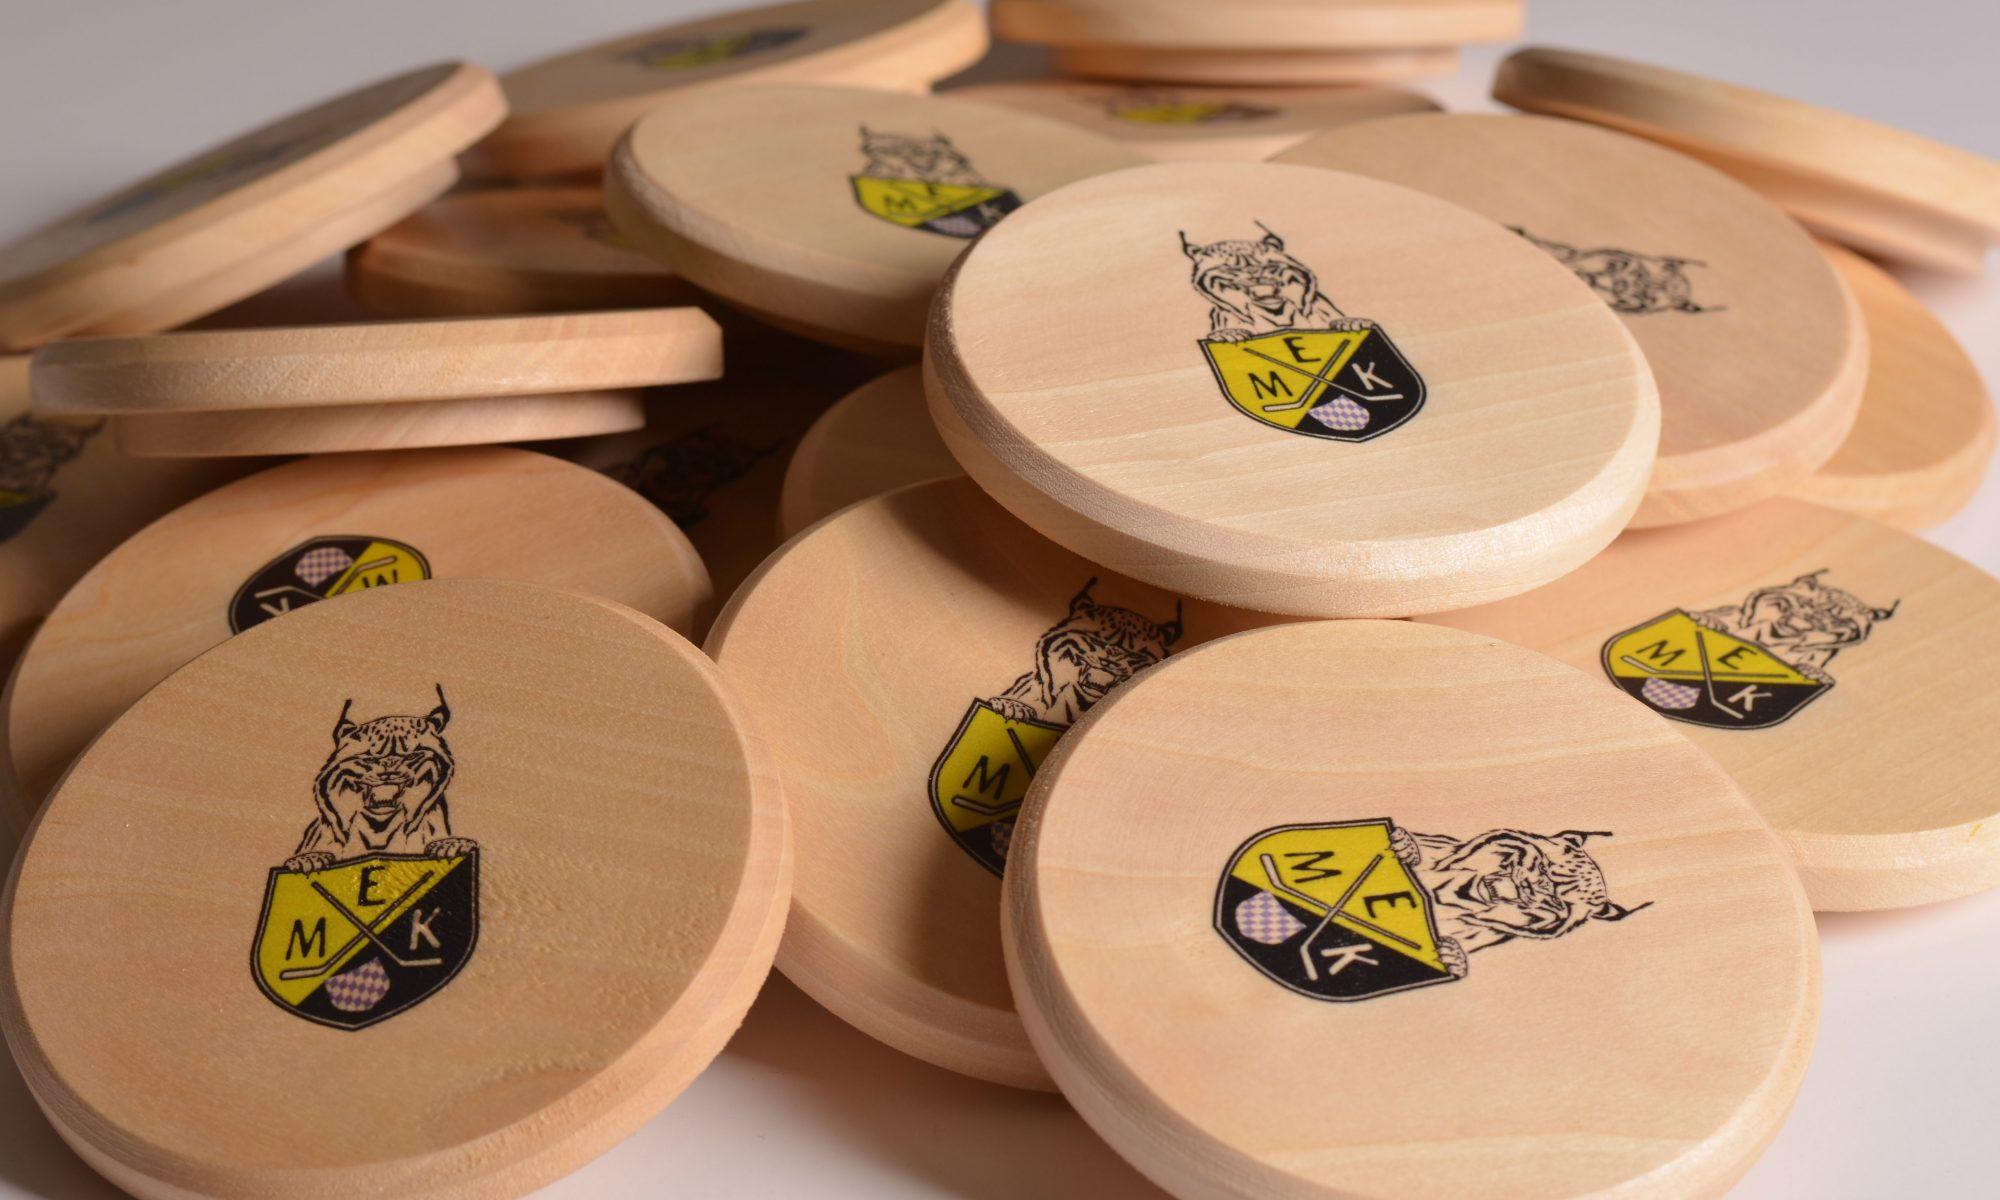 Maßkrugdeckel aus Holz